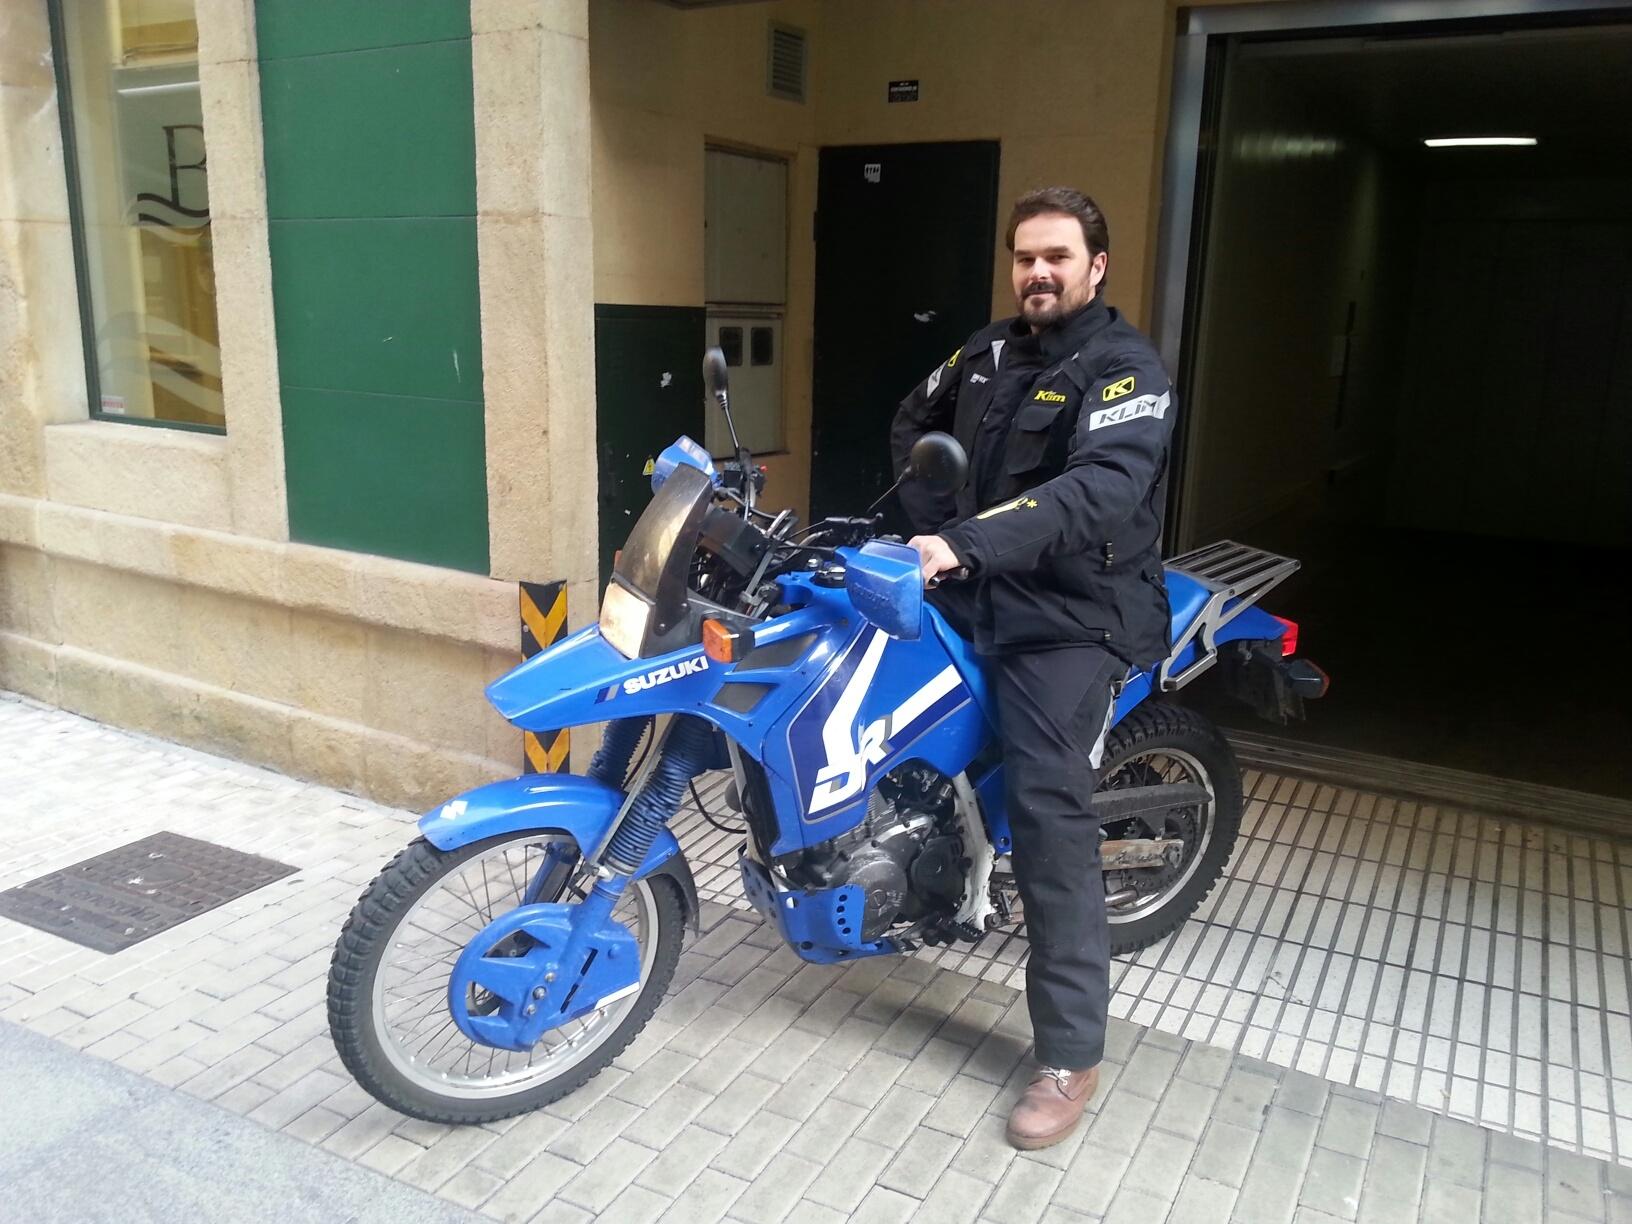 Saliendo del Garaje del Hotel Blue Santa Rosa de Gijón